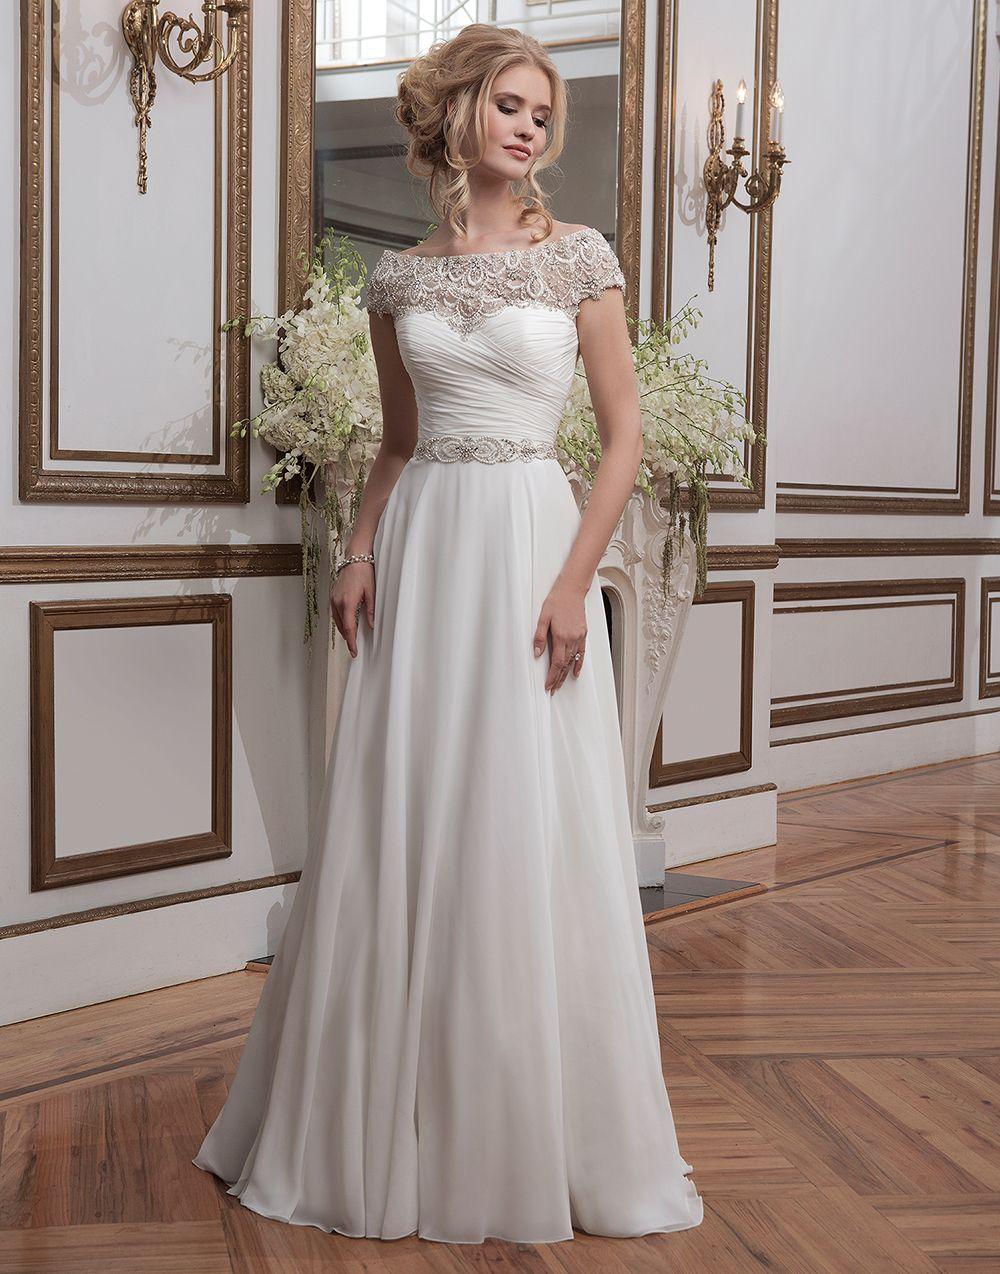 Justin Alexander wedding dresses style 8799 | Justin alexander ...